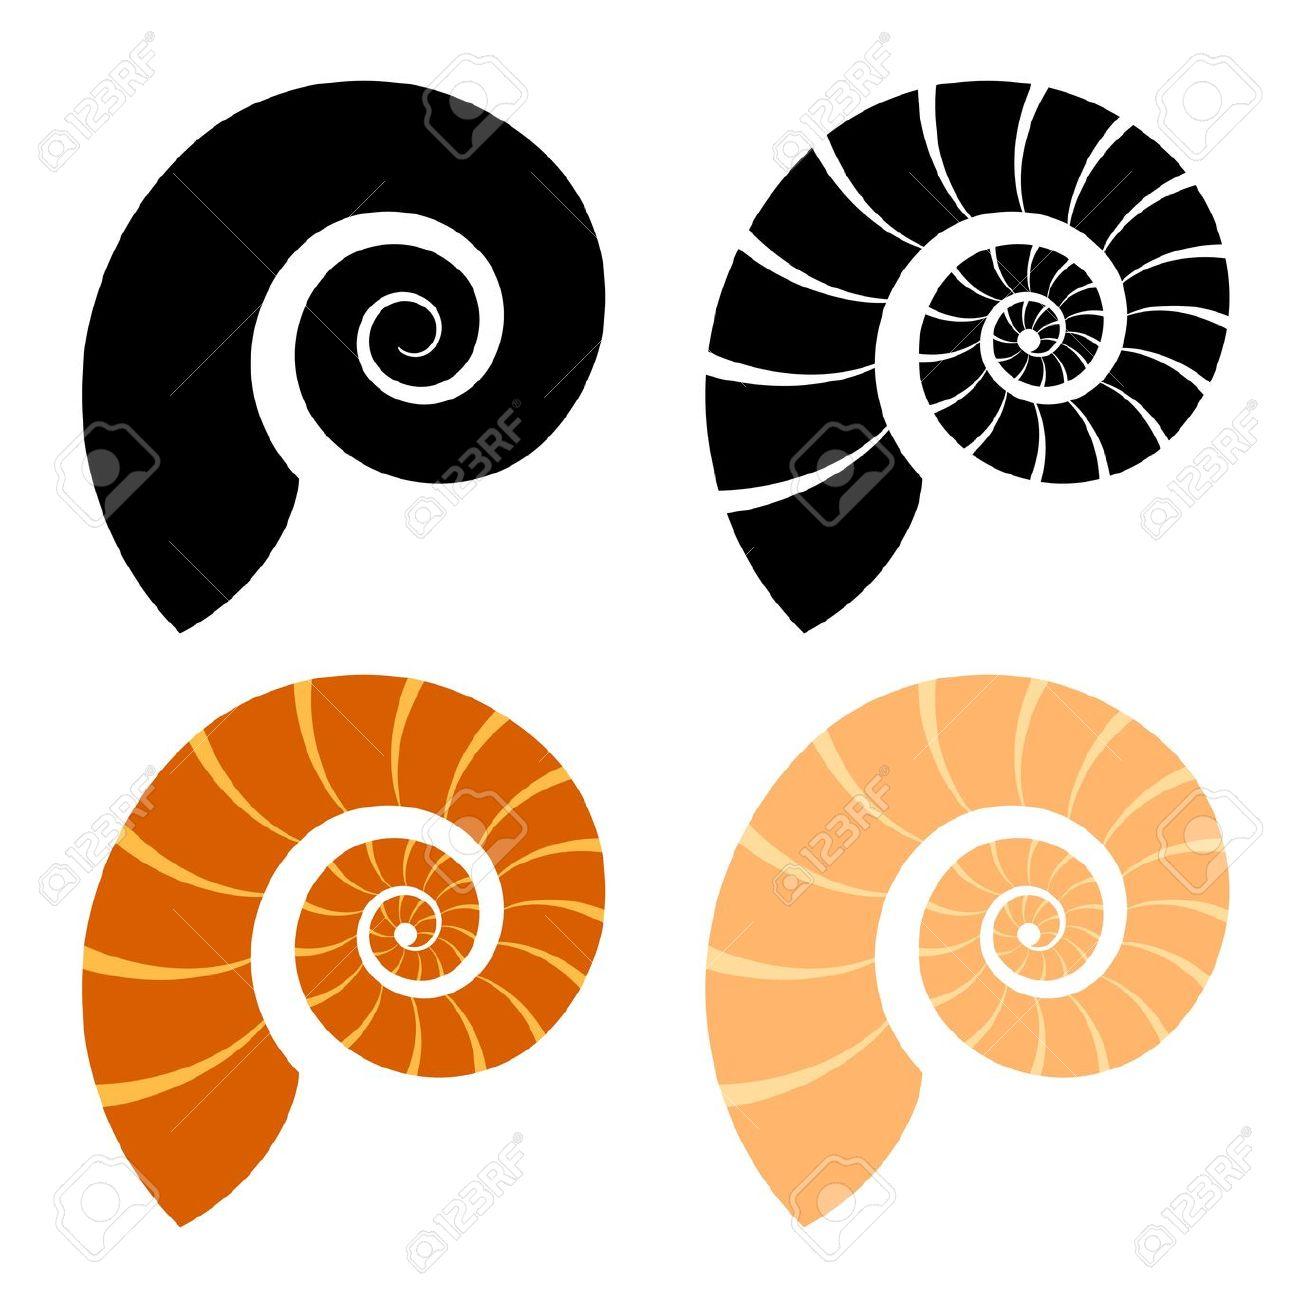 1300x1300 Snail Seashell Clipart, Explore Pictures